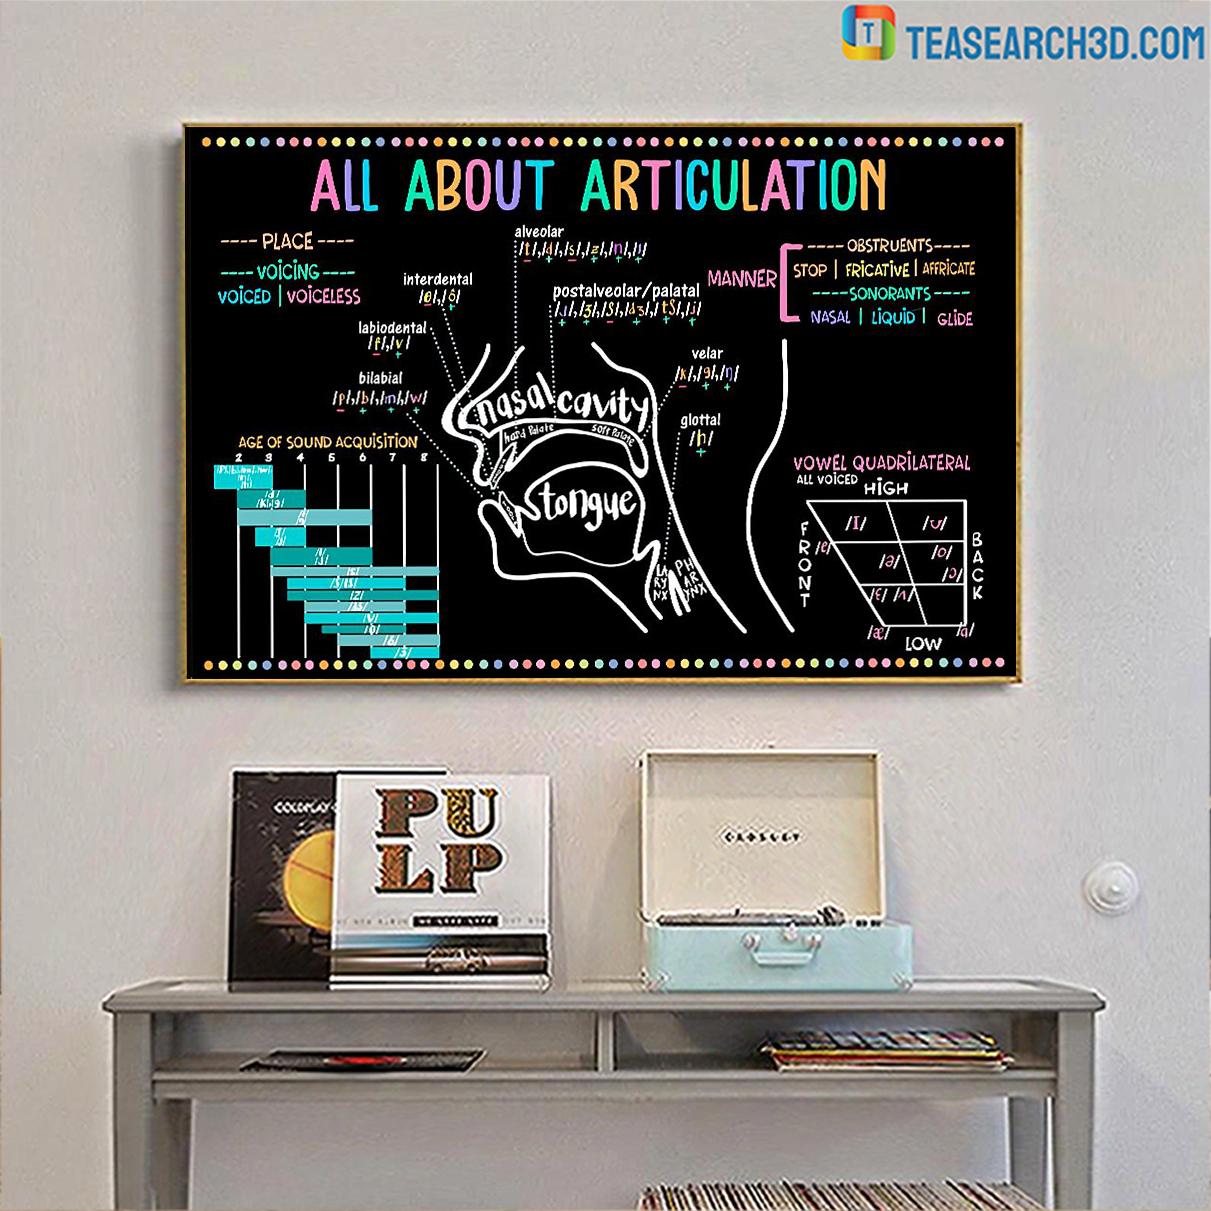 Speech language pathologist all about articulation poster A3